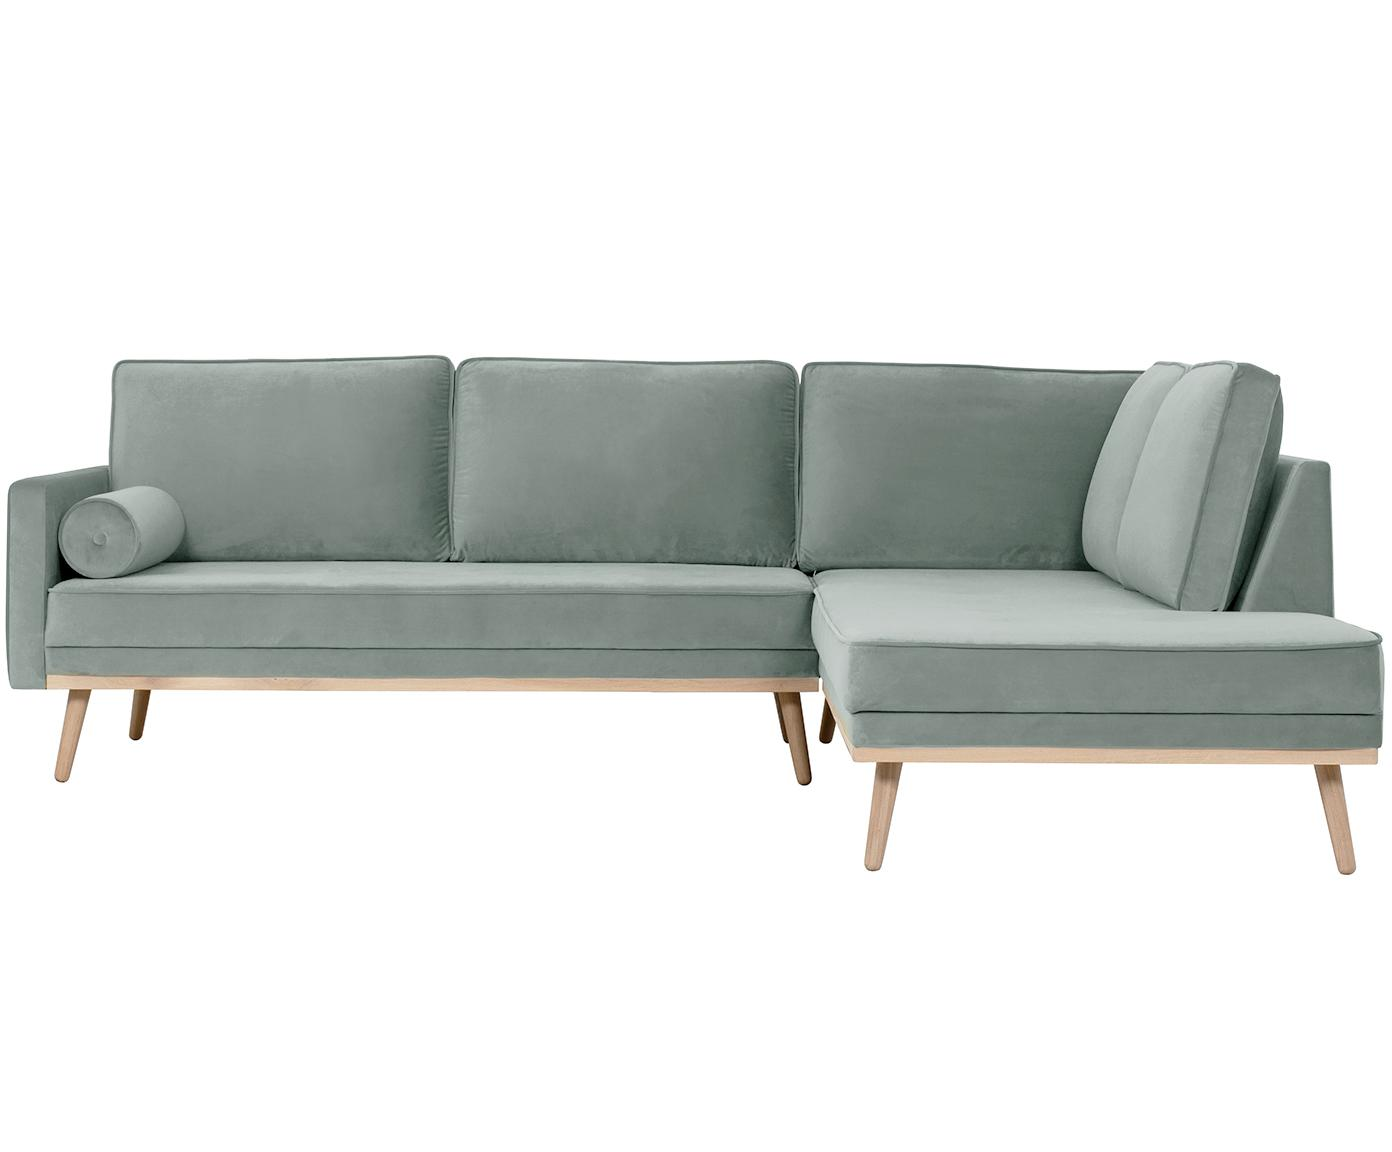 Samt-Ecksofa Saint (3-Sitzer), Bezug: Samt (Polyester) 35.000 S, Gestell: Massives Eichenholz, Span, Samt Salbeifarben, B 243 x T 220 cm